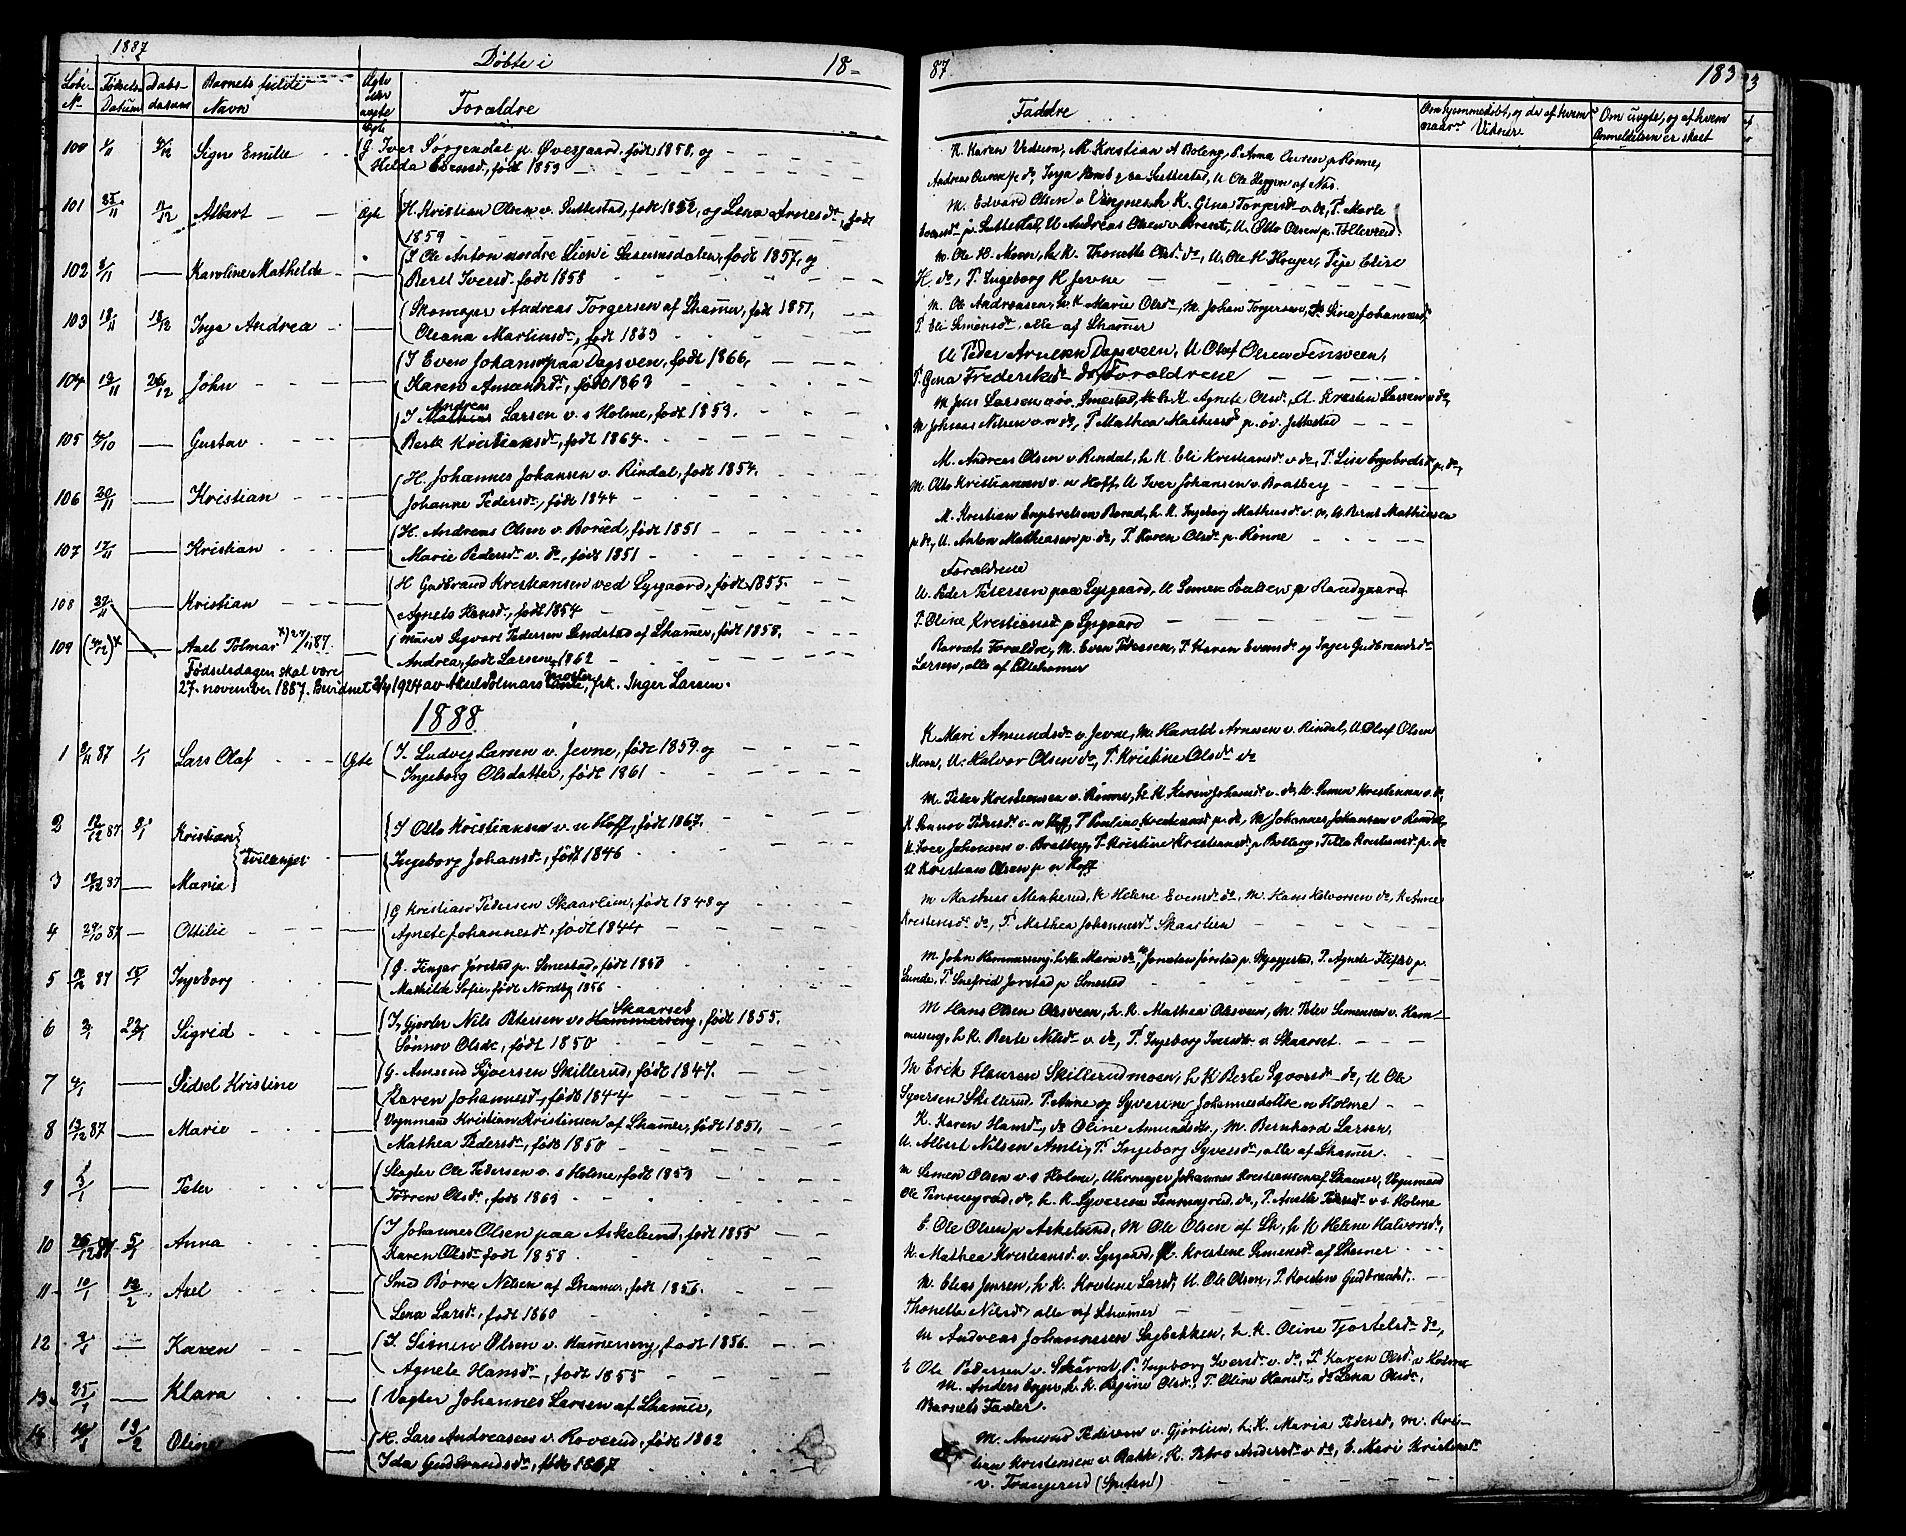 SAH, Fåberg prestekontor, Klokkerbok nr. 7, 1856-1891, s. 182-183